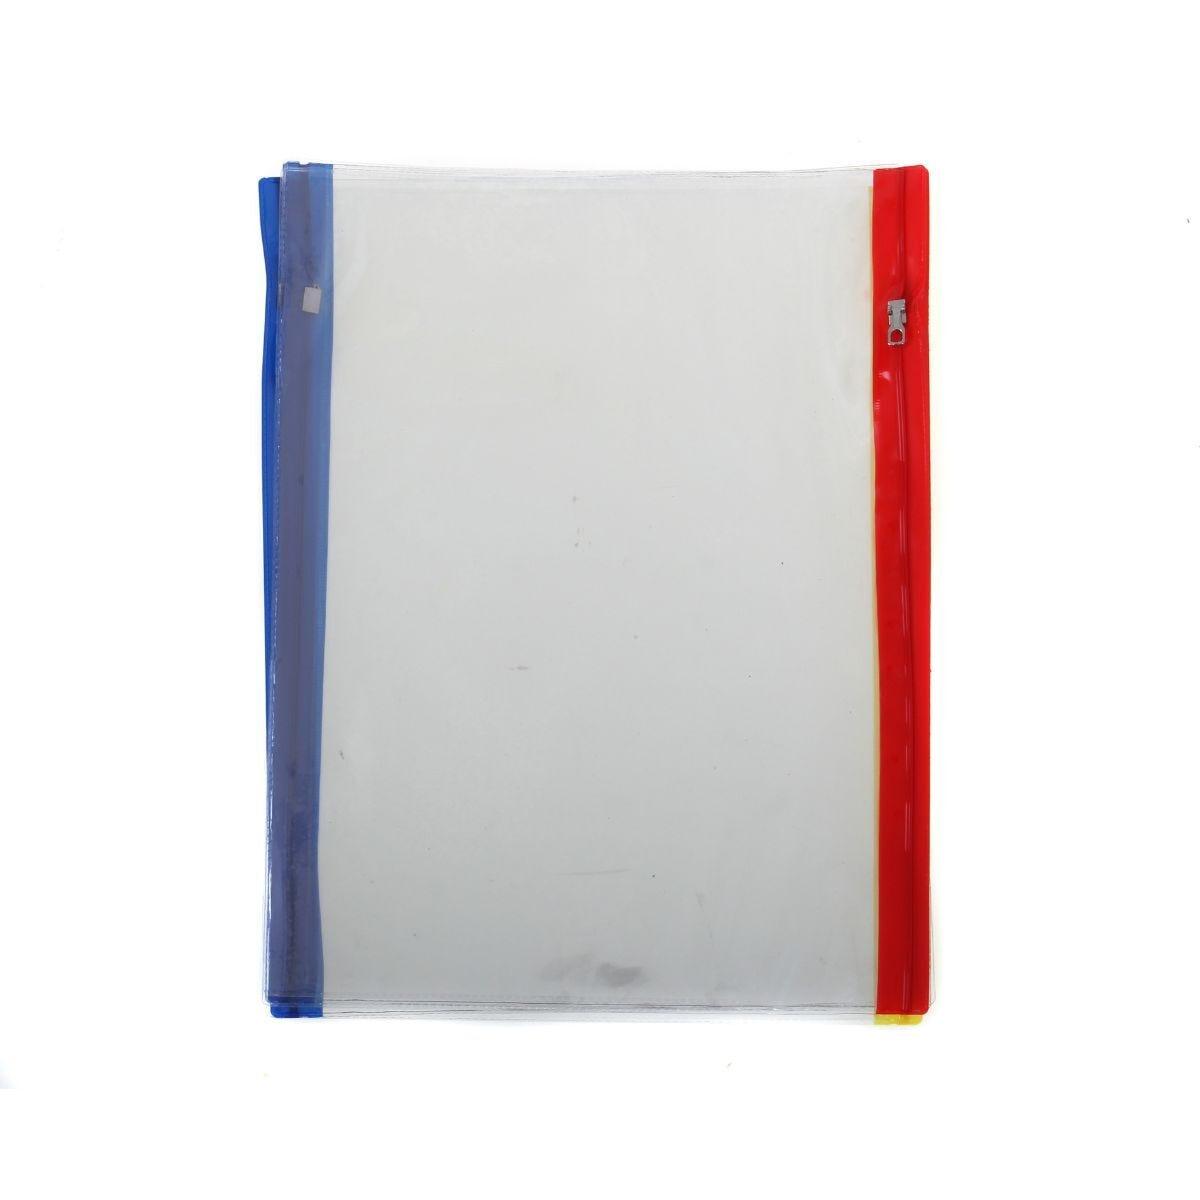 Ryman Zip Bags A4 Pack of 5